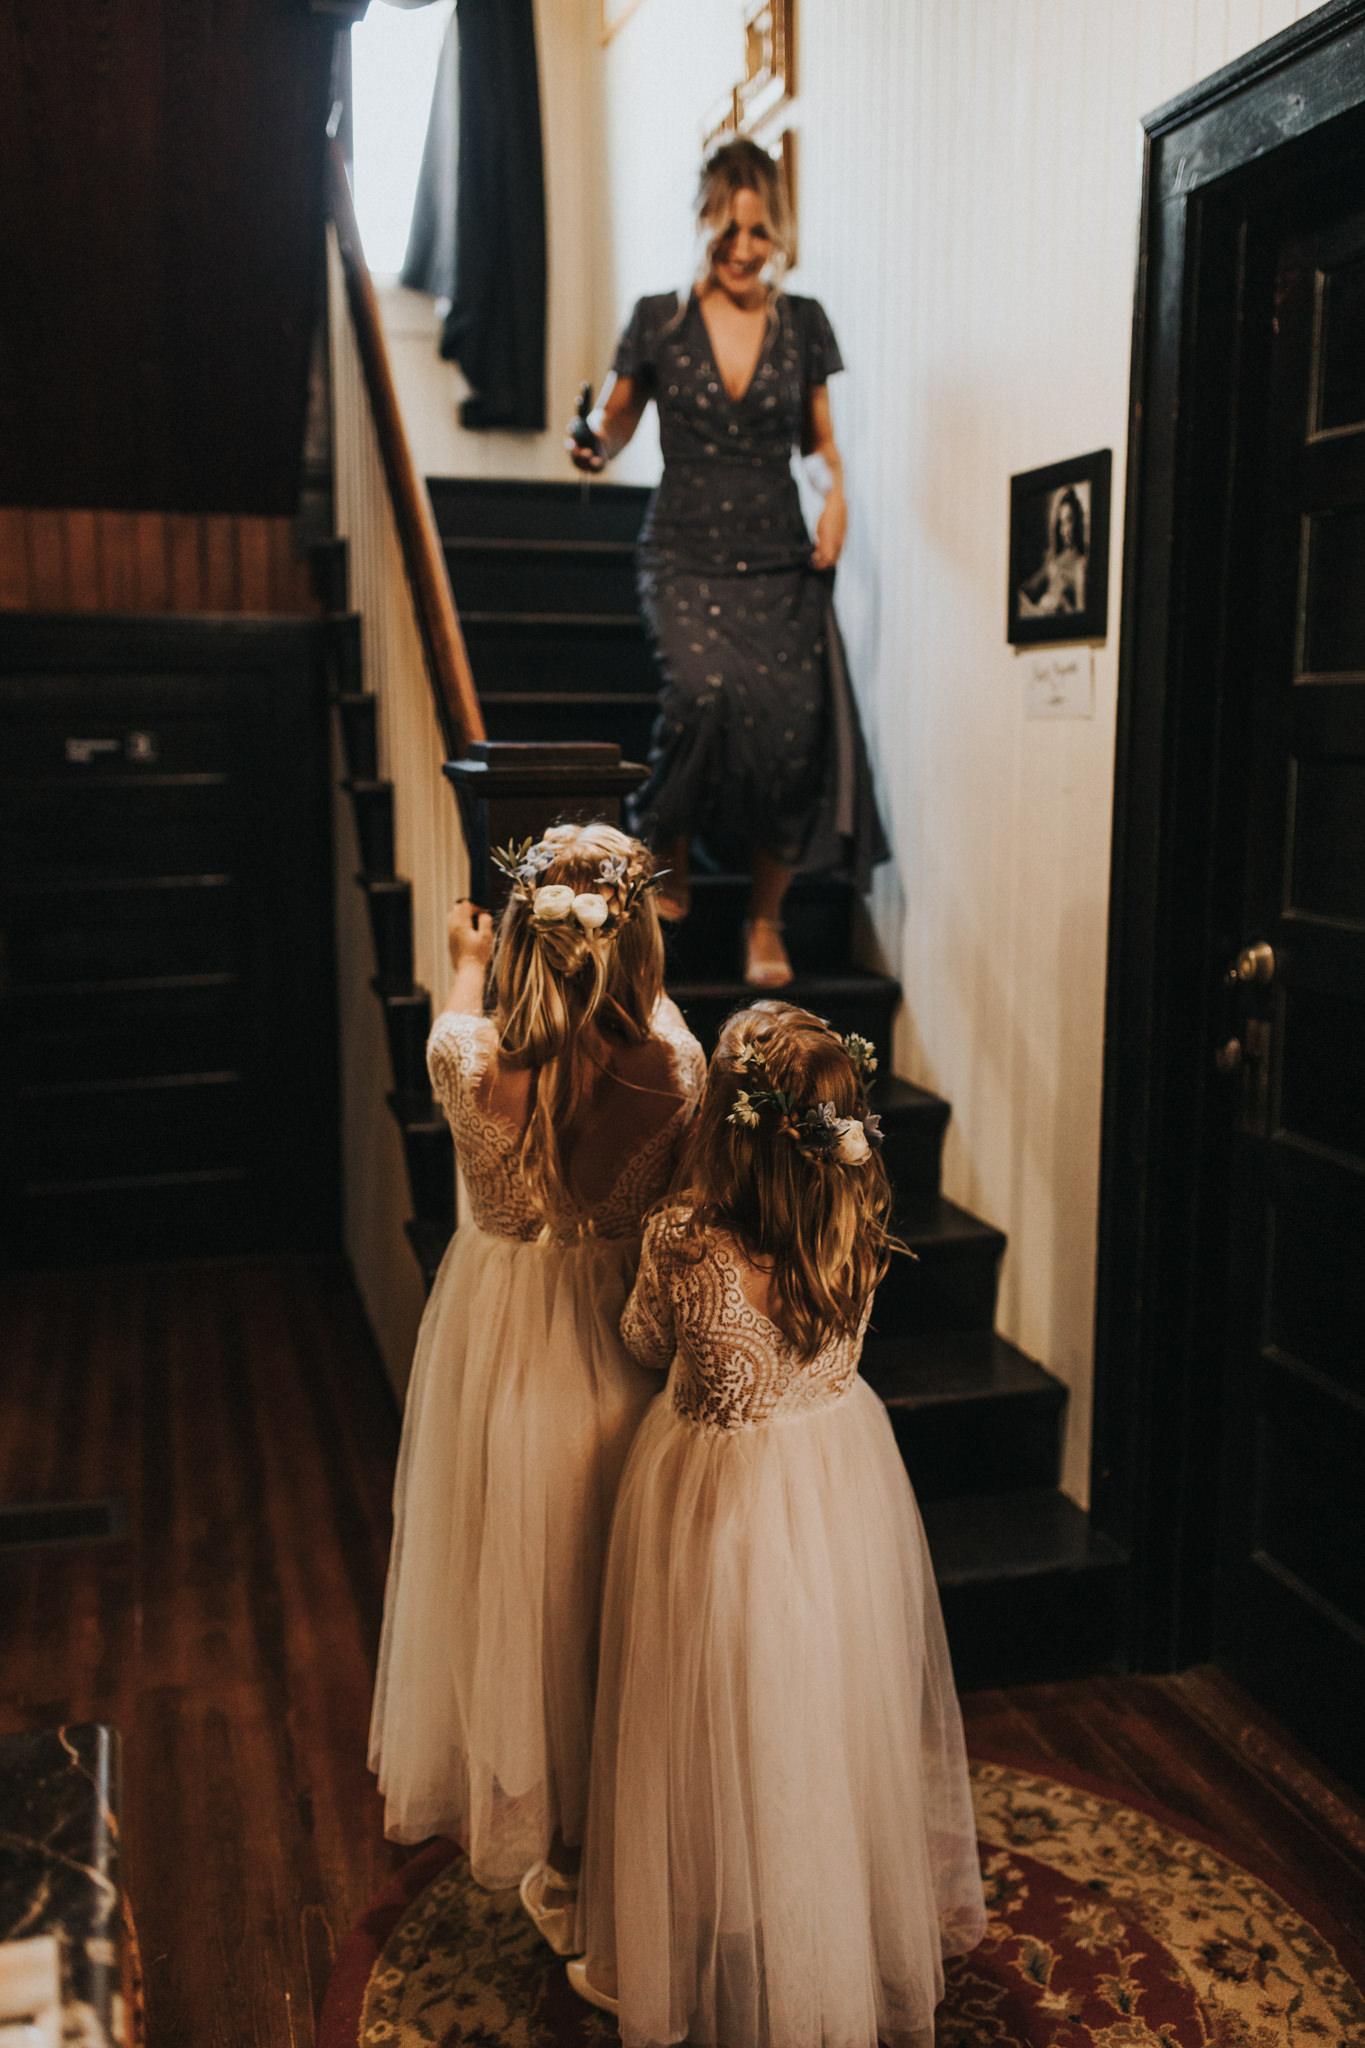 KateMatt-North-Georgia-Wedding-Photographer-Mountain-Laurel-Farm-31.jpg